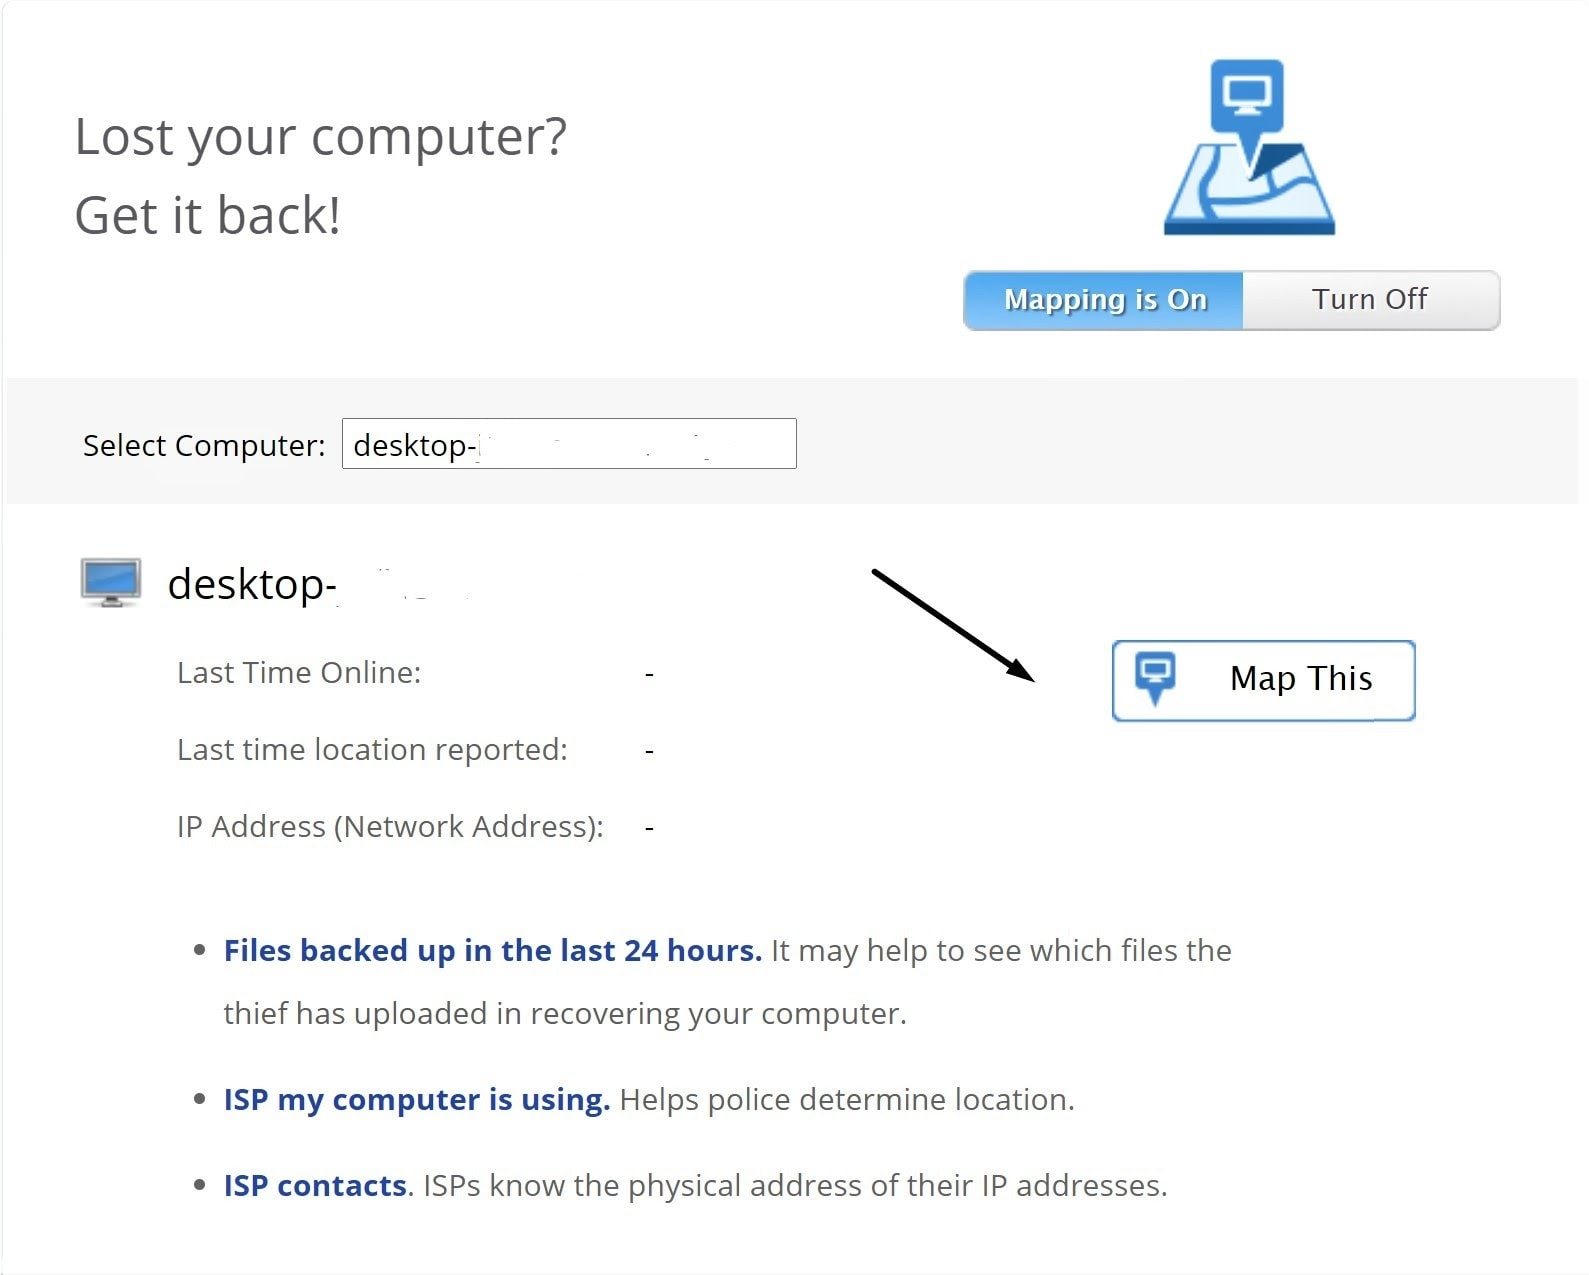 Backblaze find my computer feature